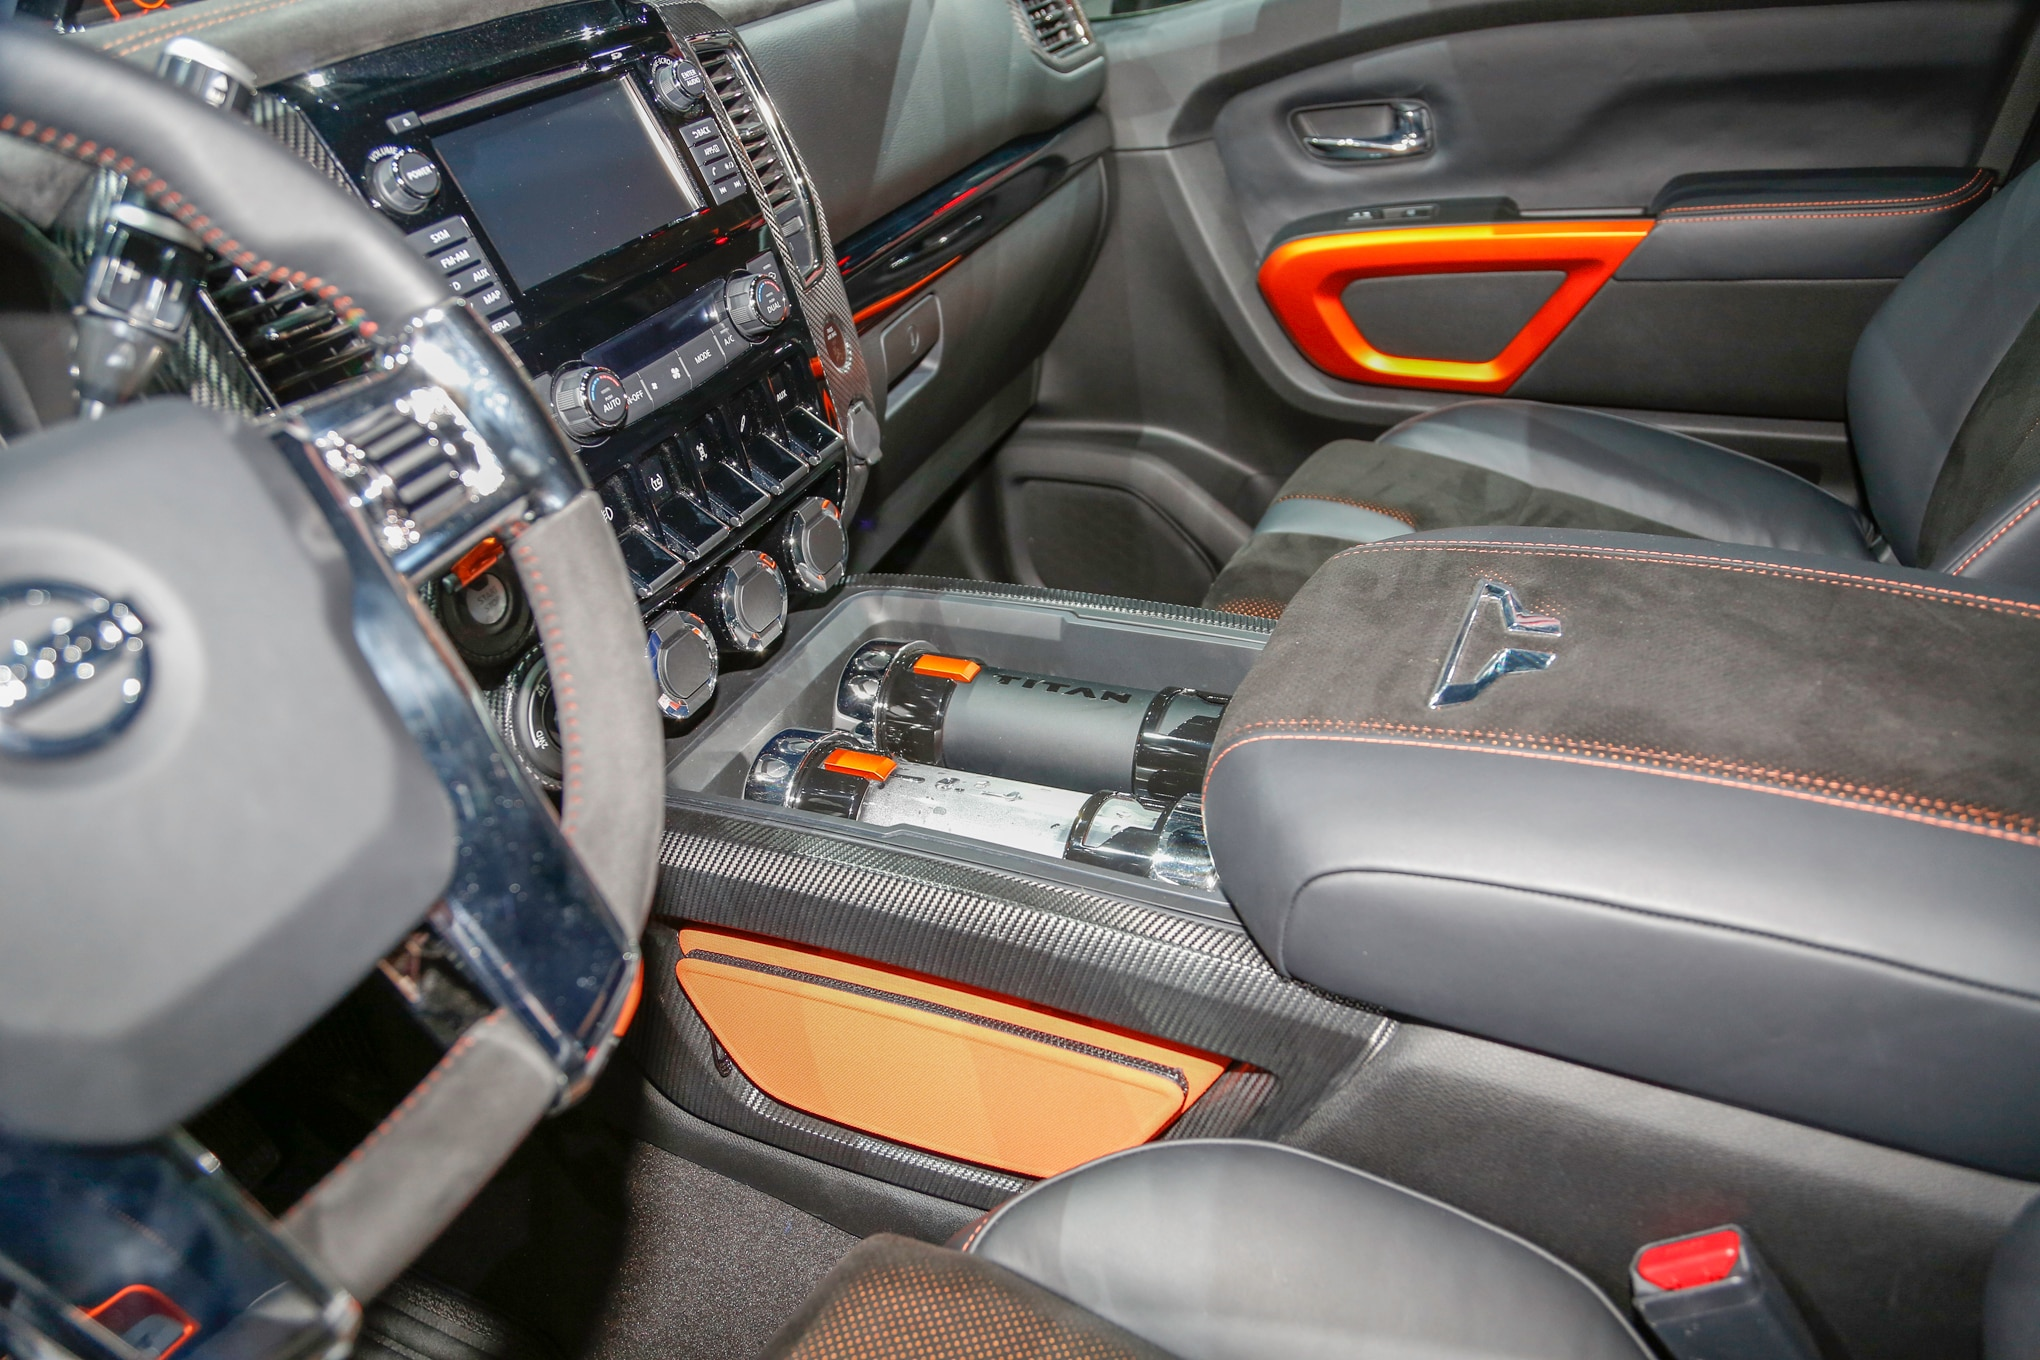 Nissan Diesel Truck >> Nissan Titan Warrior Concept is an Off-Road Monster